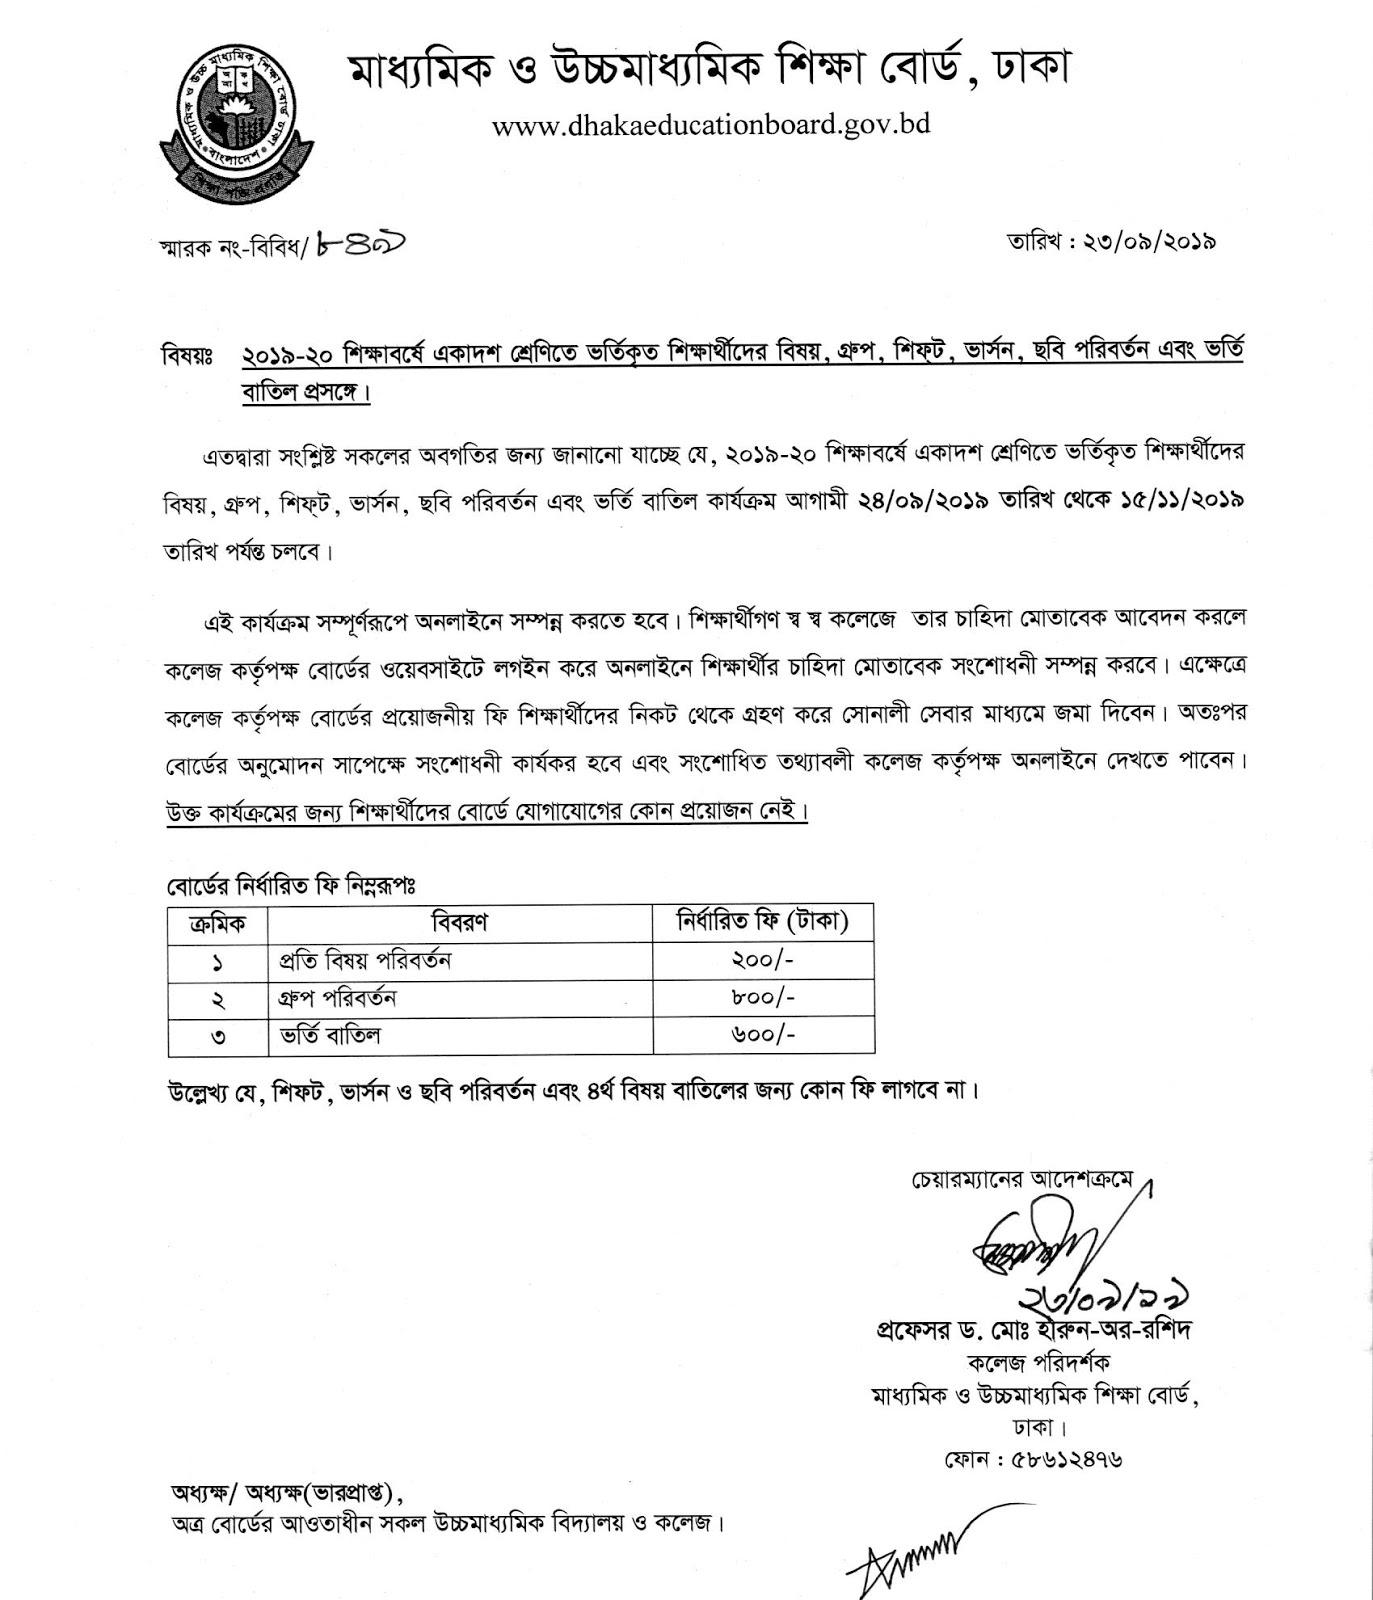 Dhaka Board HSC 1st Year (XI) Group Change Notice 2019